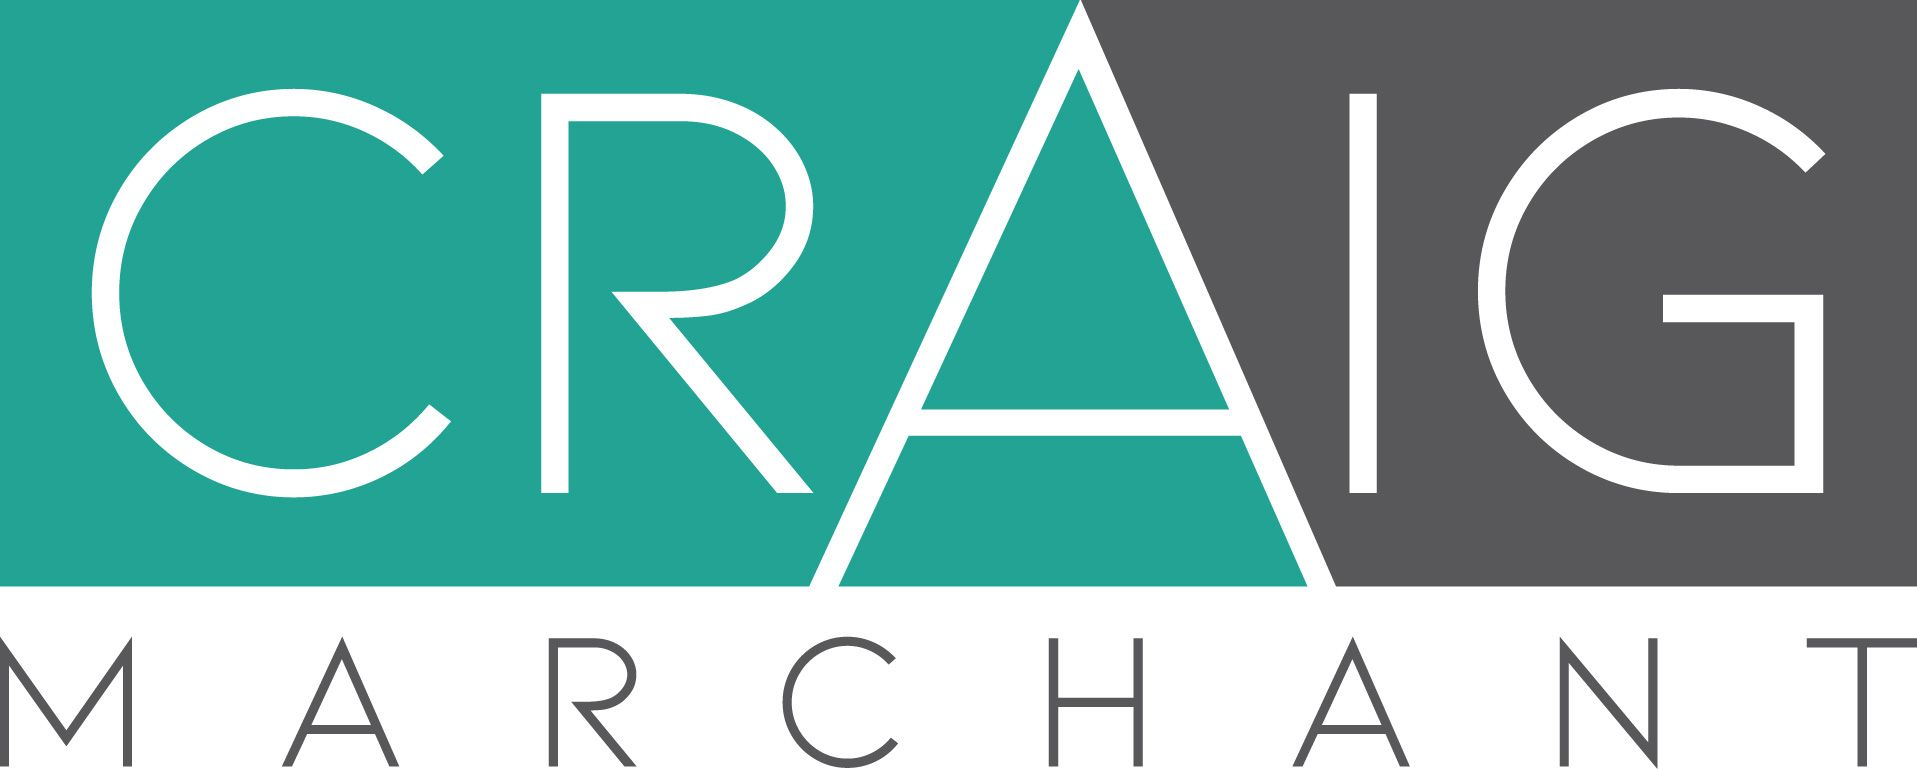 Craig Marchant Logo